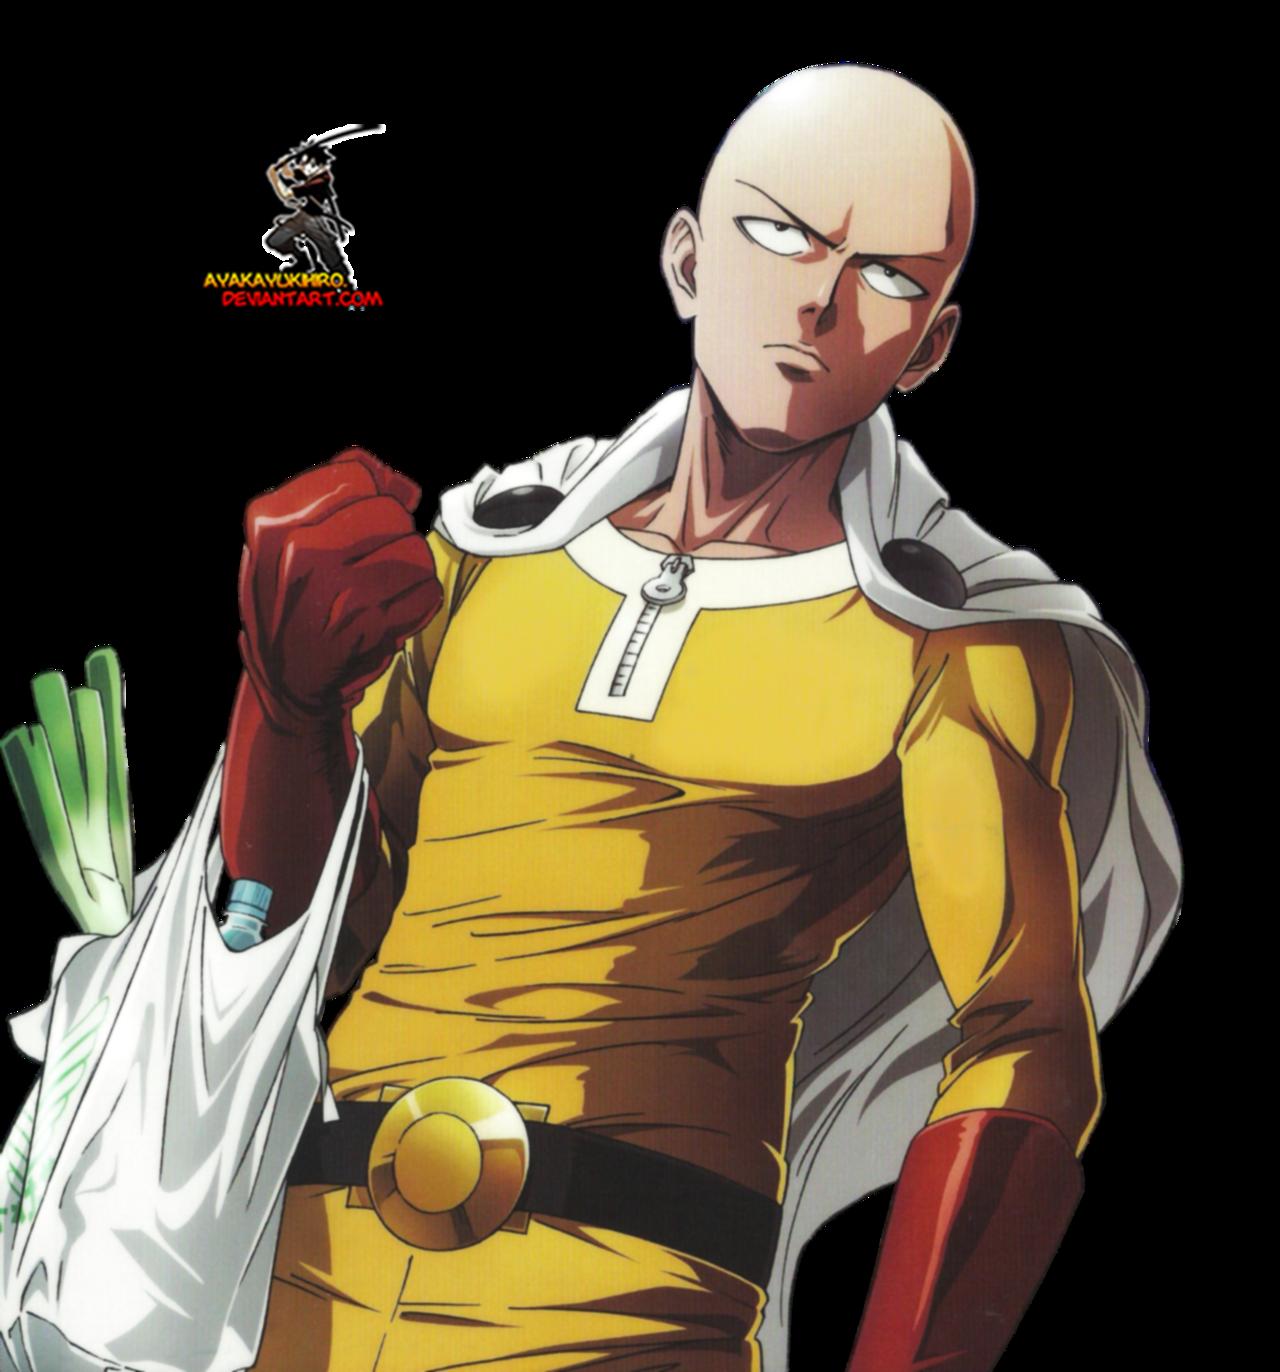 One Punch Man Saitama Sensei Render By Ayakayukihiro D9jjfvx Png 1280 1372 One Punch Man One Punch Man Funny One Punch Man Anime